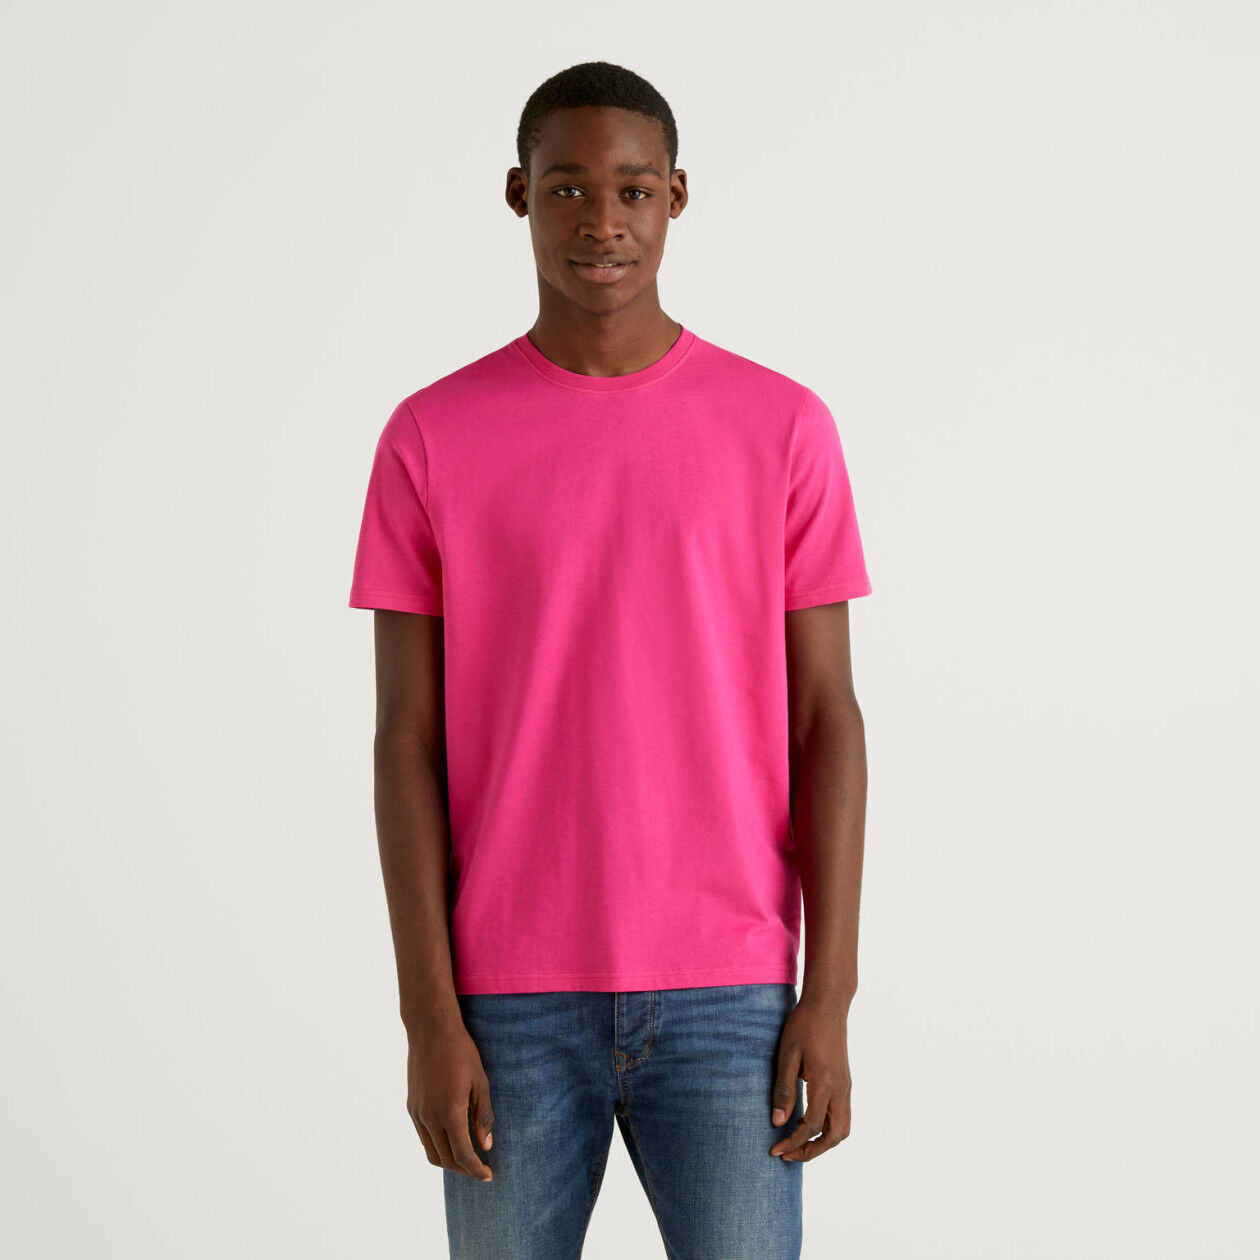 Camiseta fucsia de algodón puro